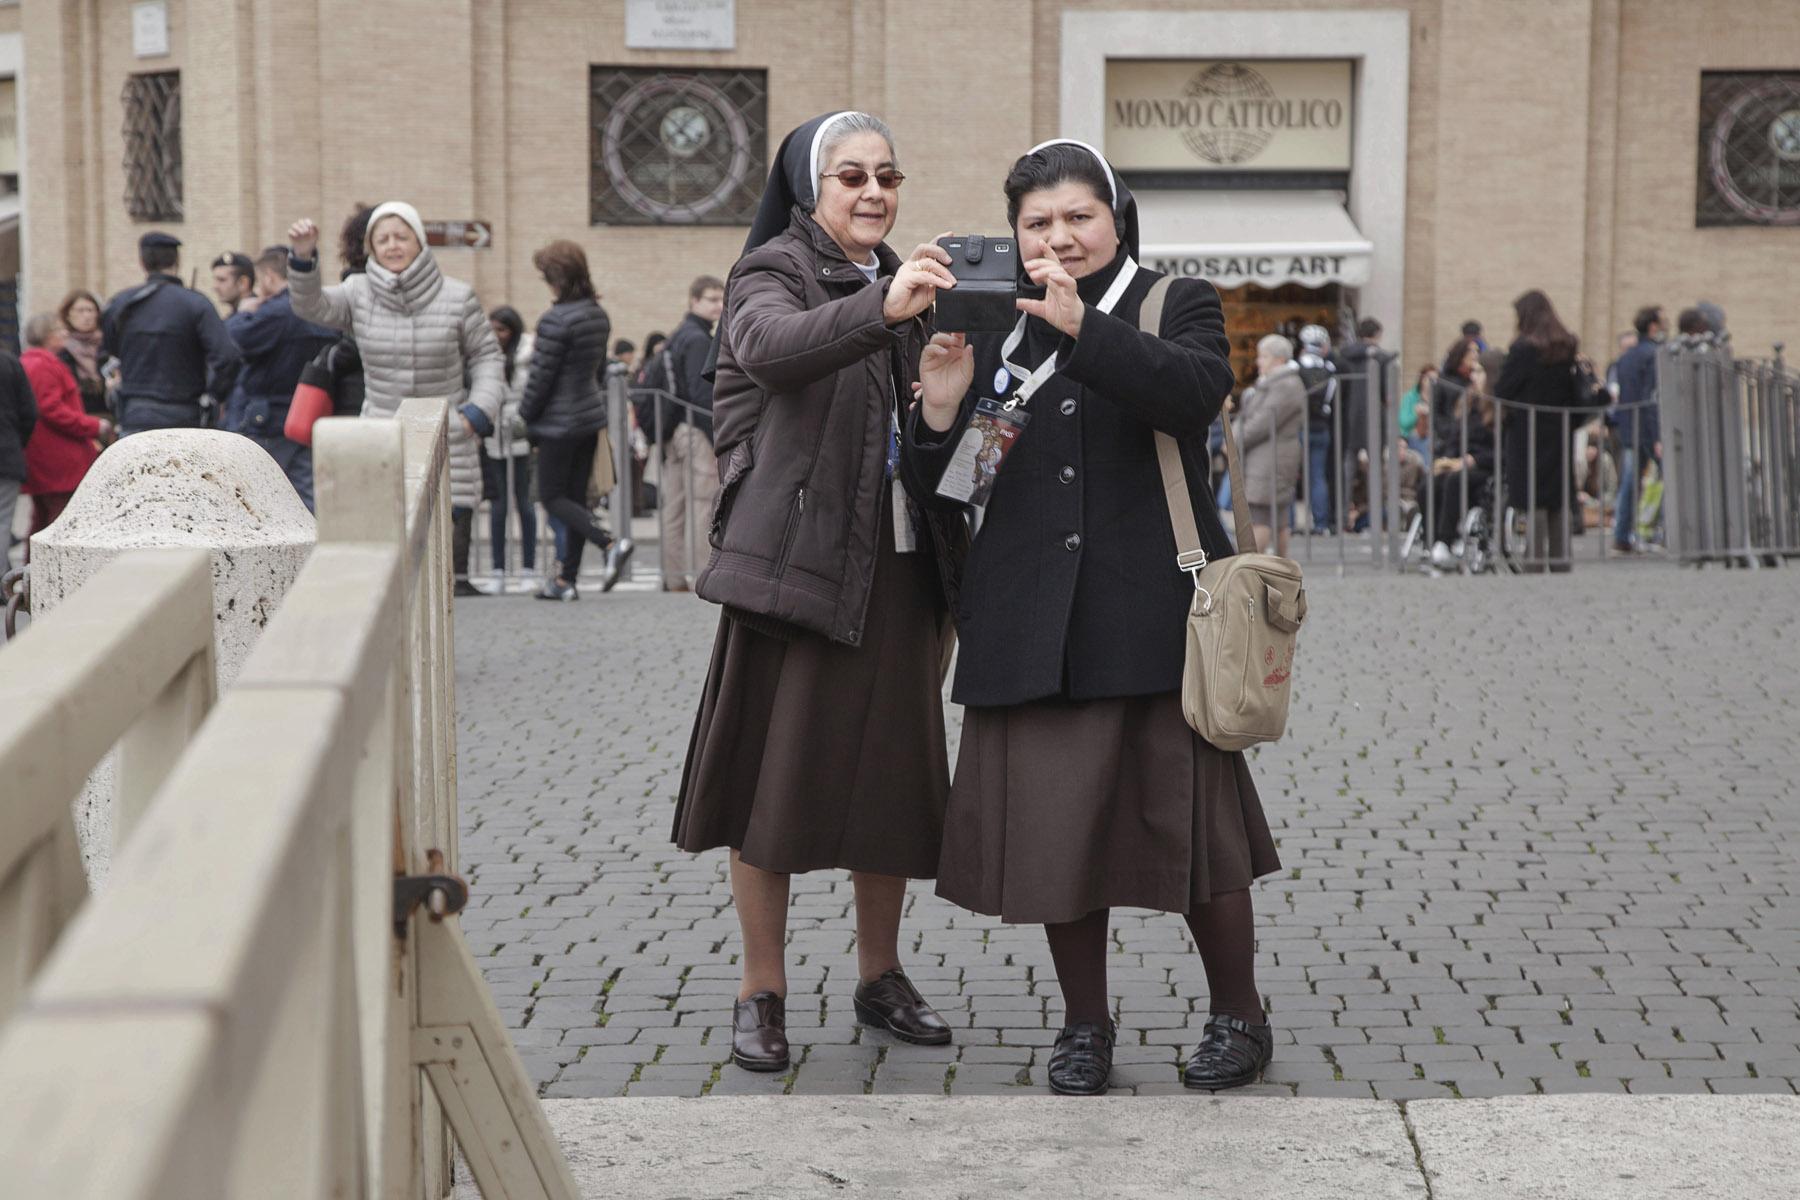 Chiara Spaghetti Kurtovic Popes Two 17